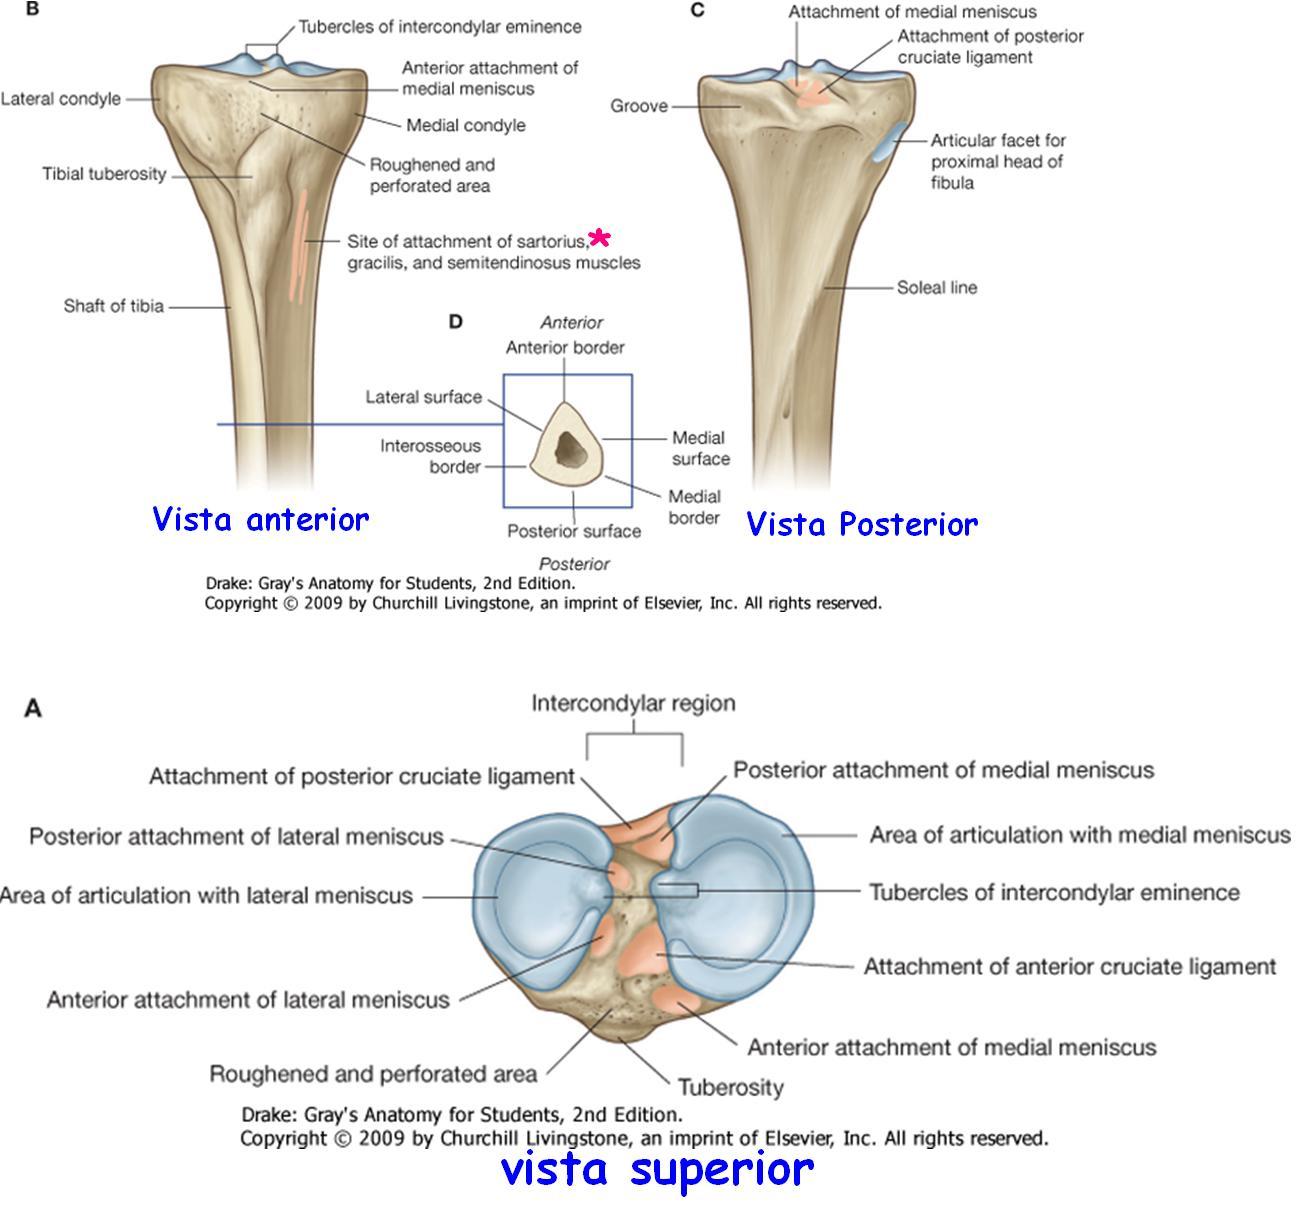 Anatomía UNAM: TIBIA